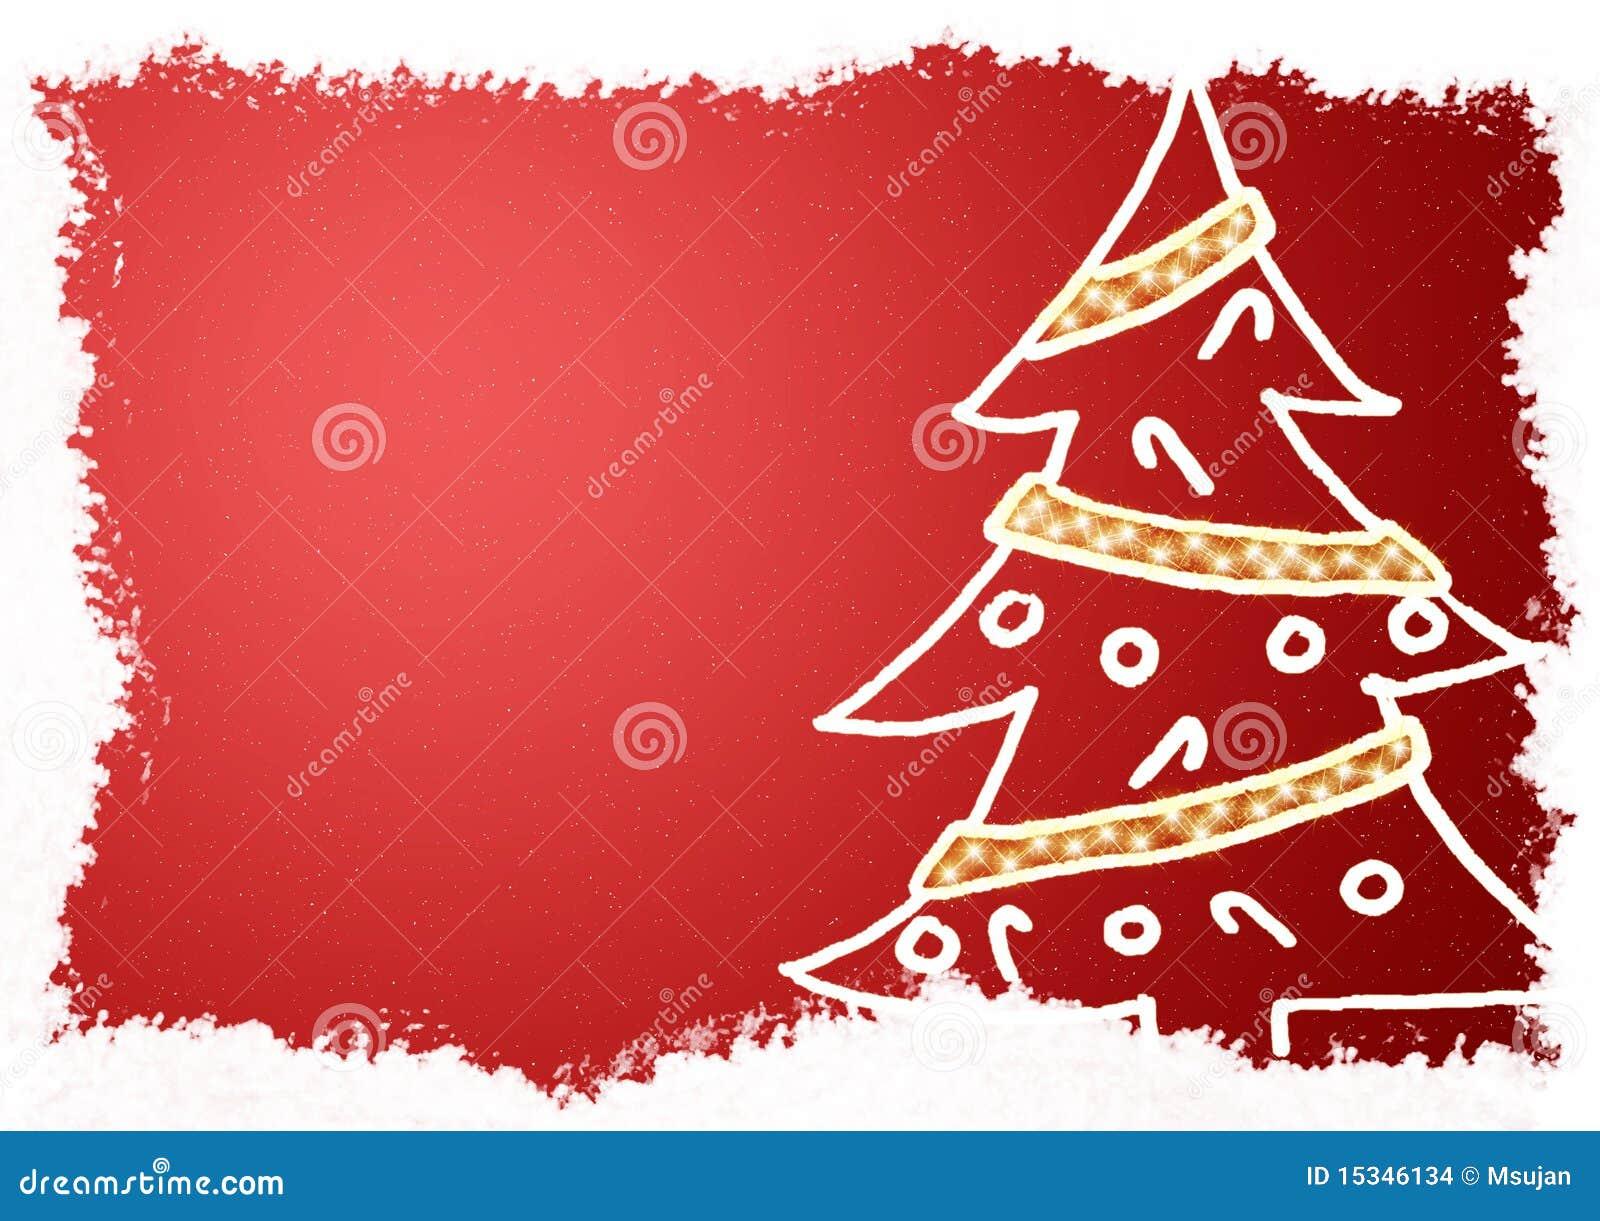 Tarjeta de navidad elegante imagenes de archivo imagen - Tarjetas de navidad elegantes ...